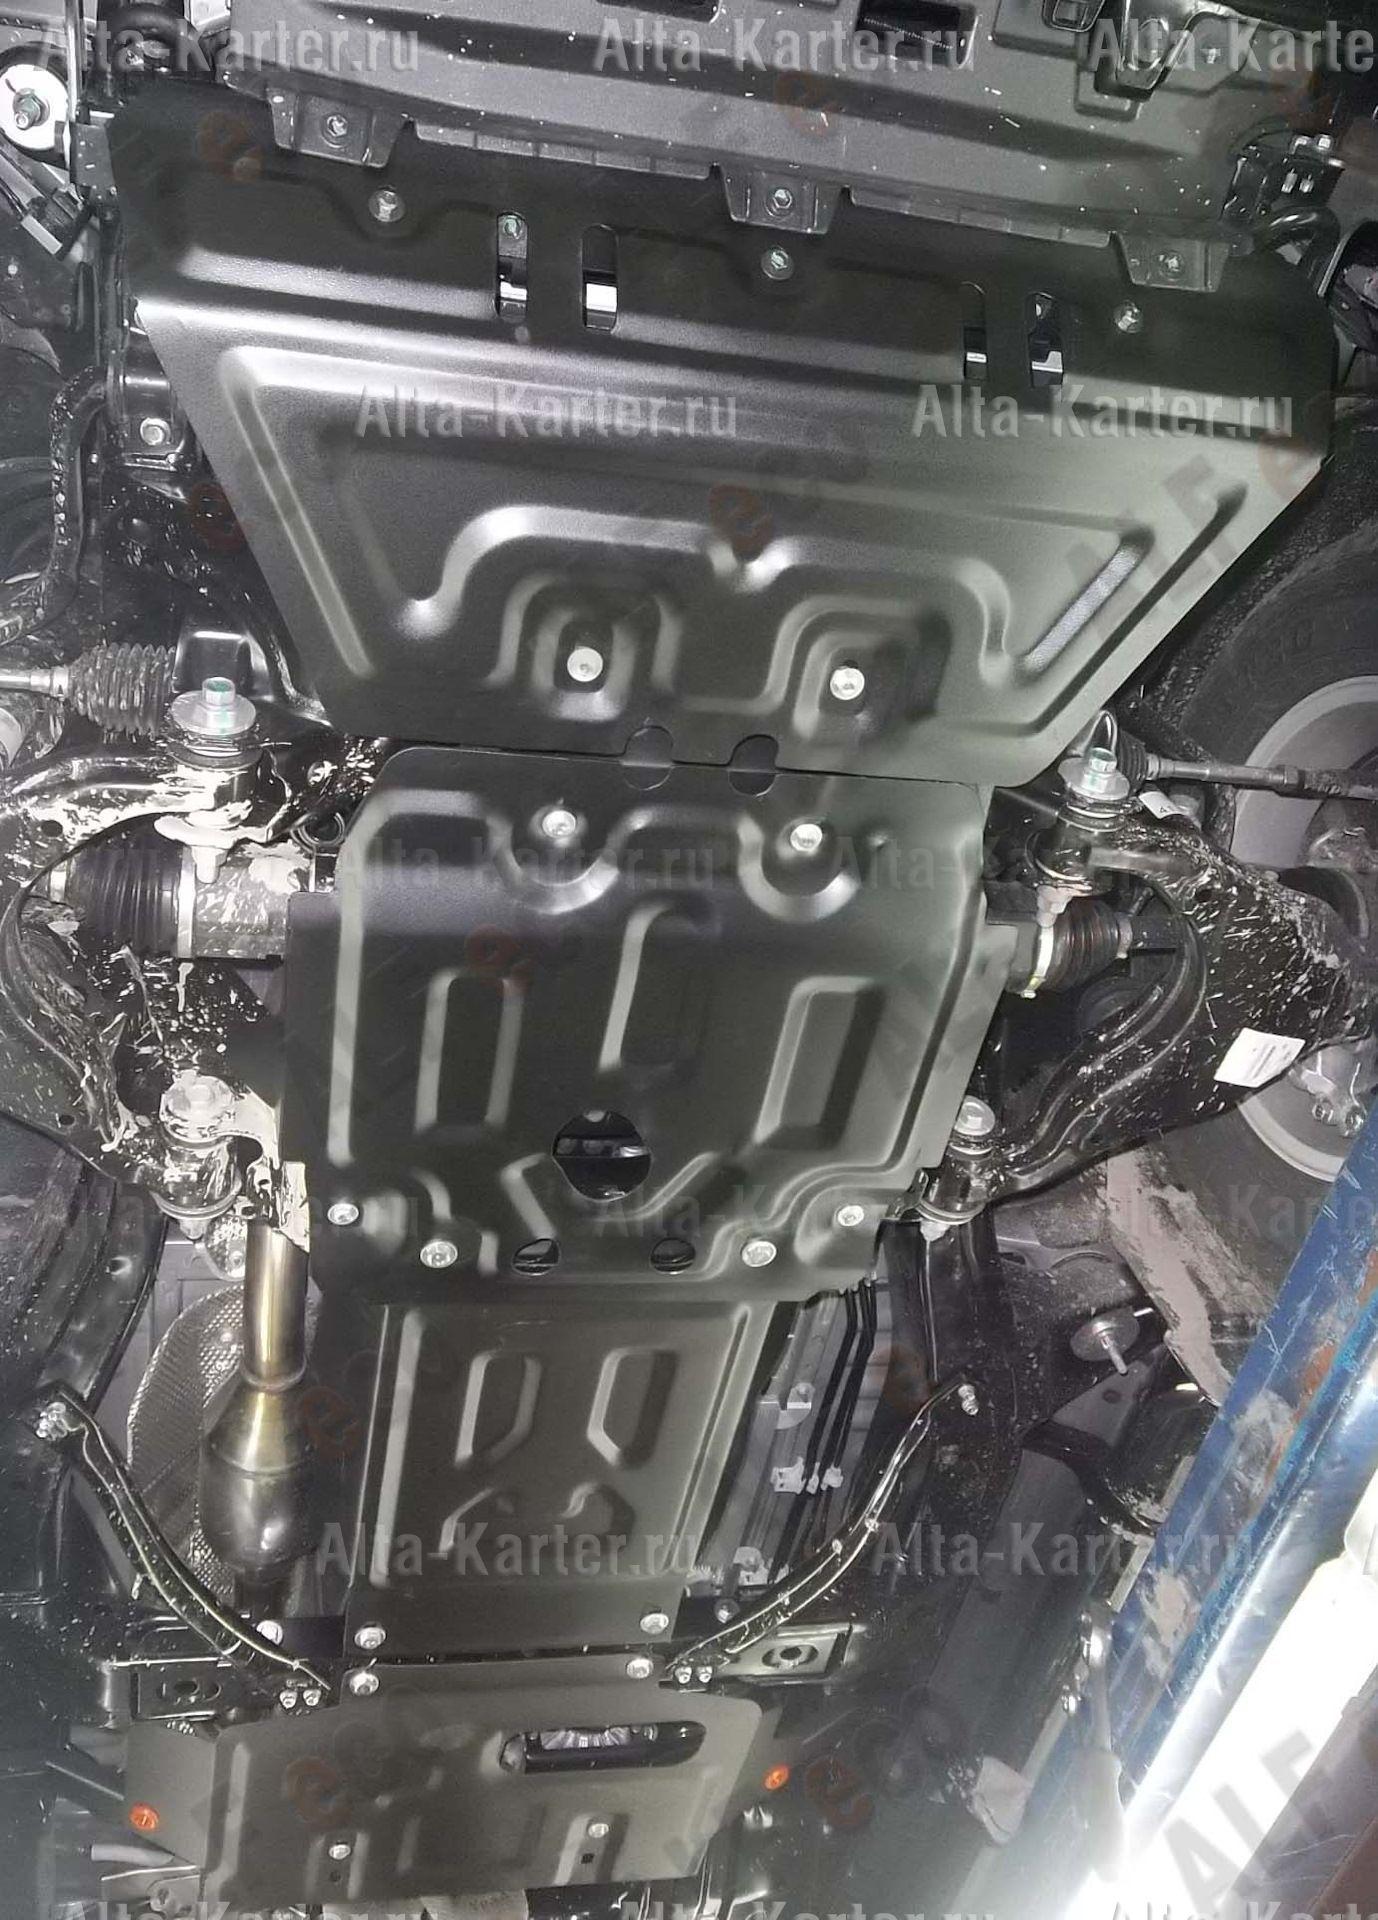 Защита Alfeco для картера, КПП, раздатки и рулевых тяг Lexus GX 460 2009-2021. Артикул ALF.24.40,41,42,43